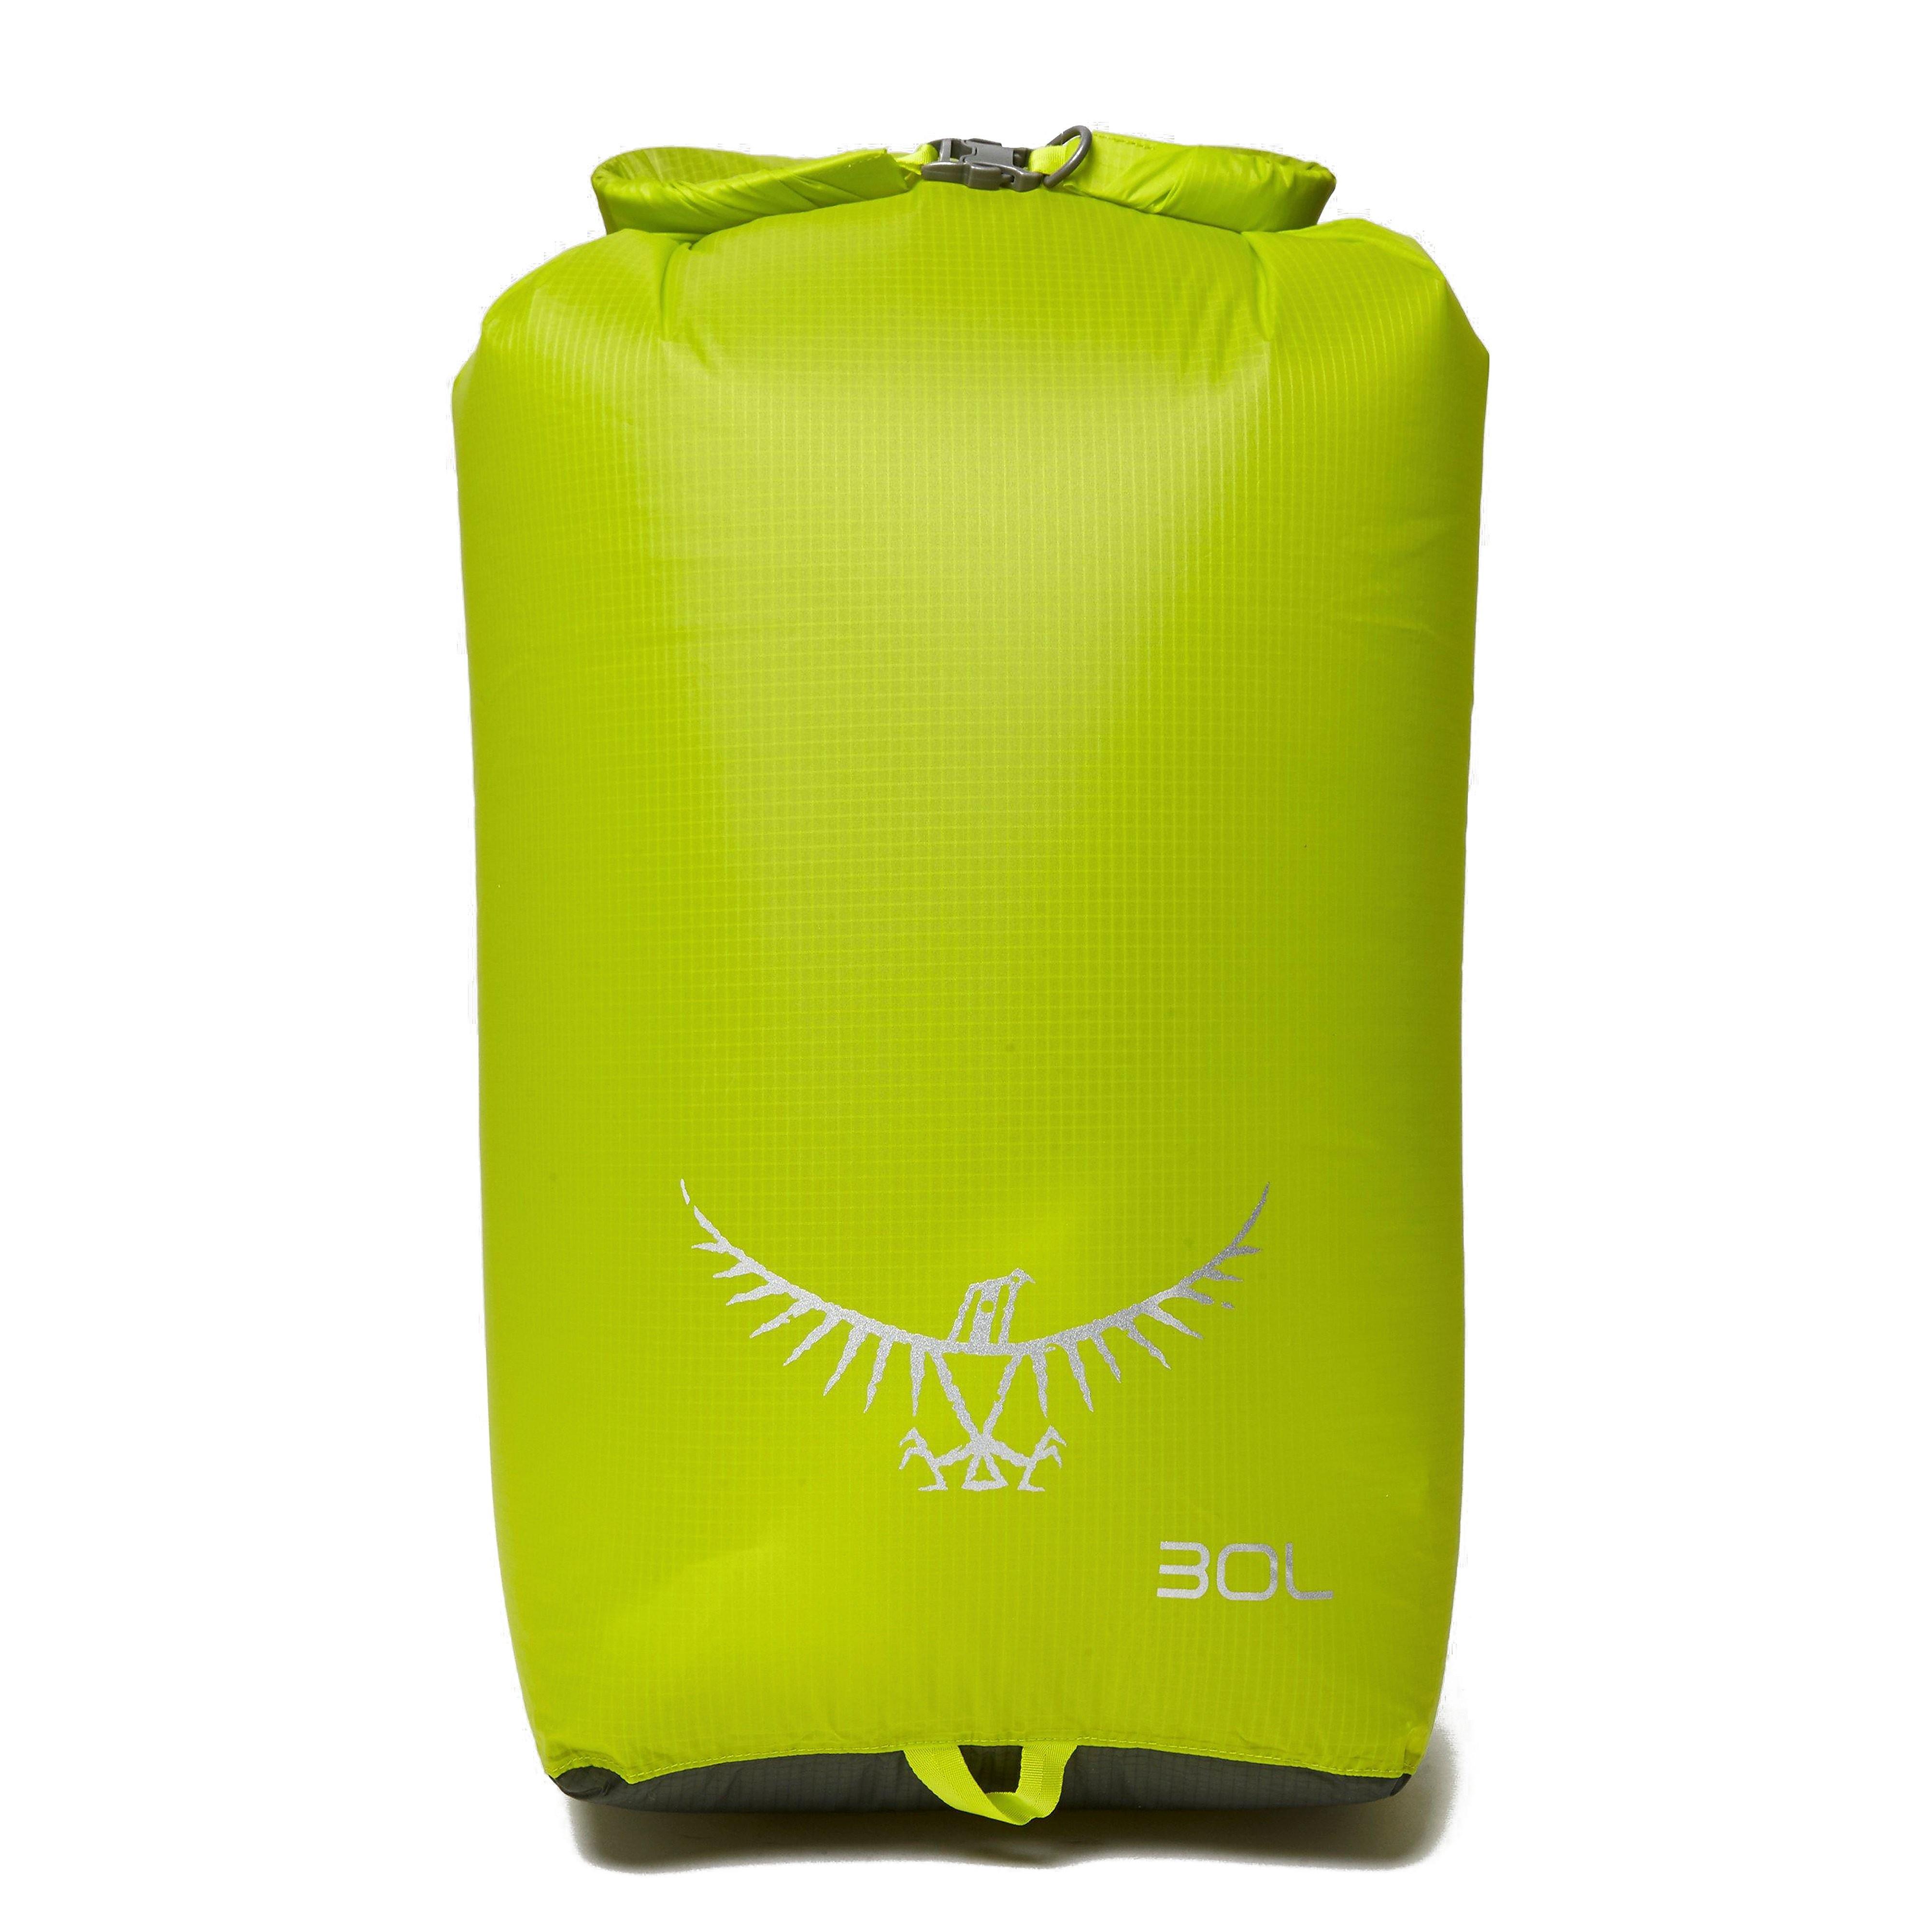 Osprey Ultralight 30L Dry Sack